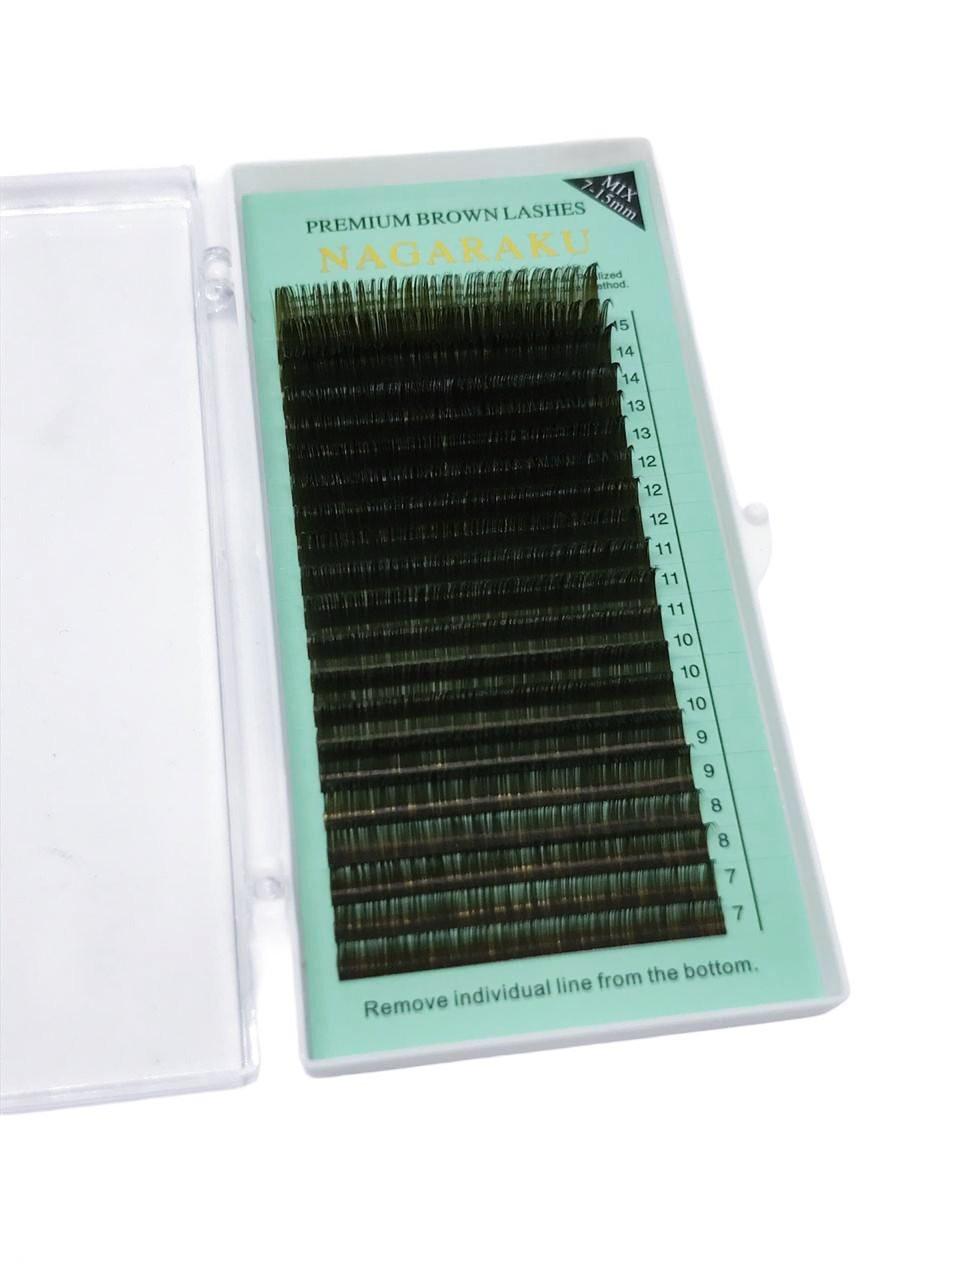 Cílios Nagaraku Extensão 3d Volume Russo 7-15mm Mix Marrom 0.07D